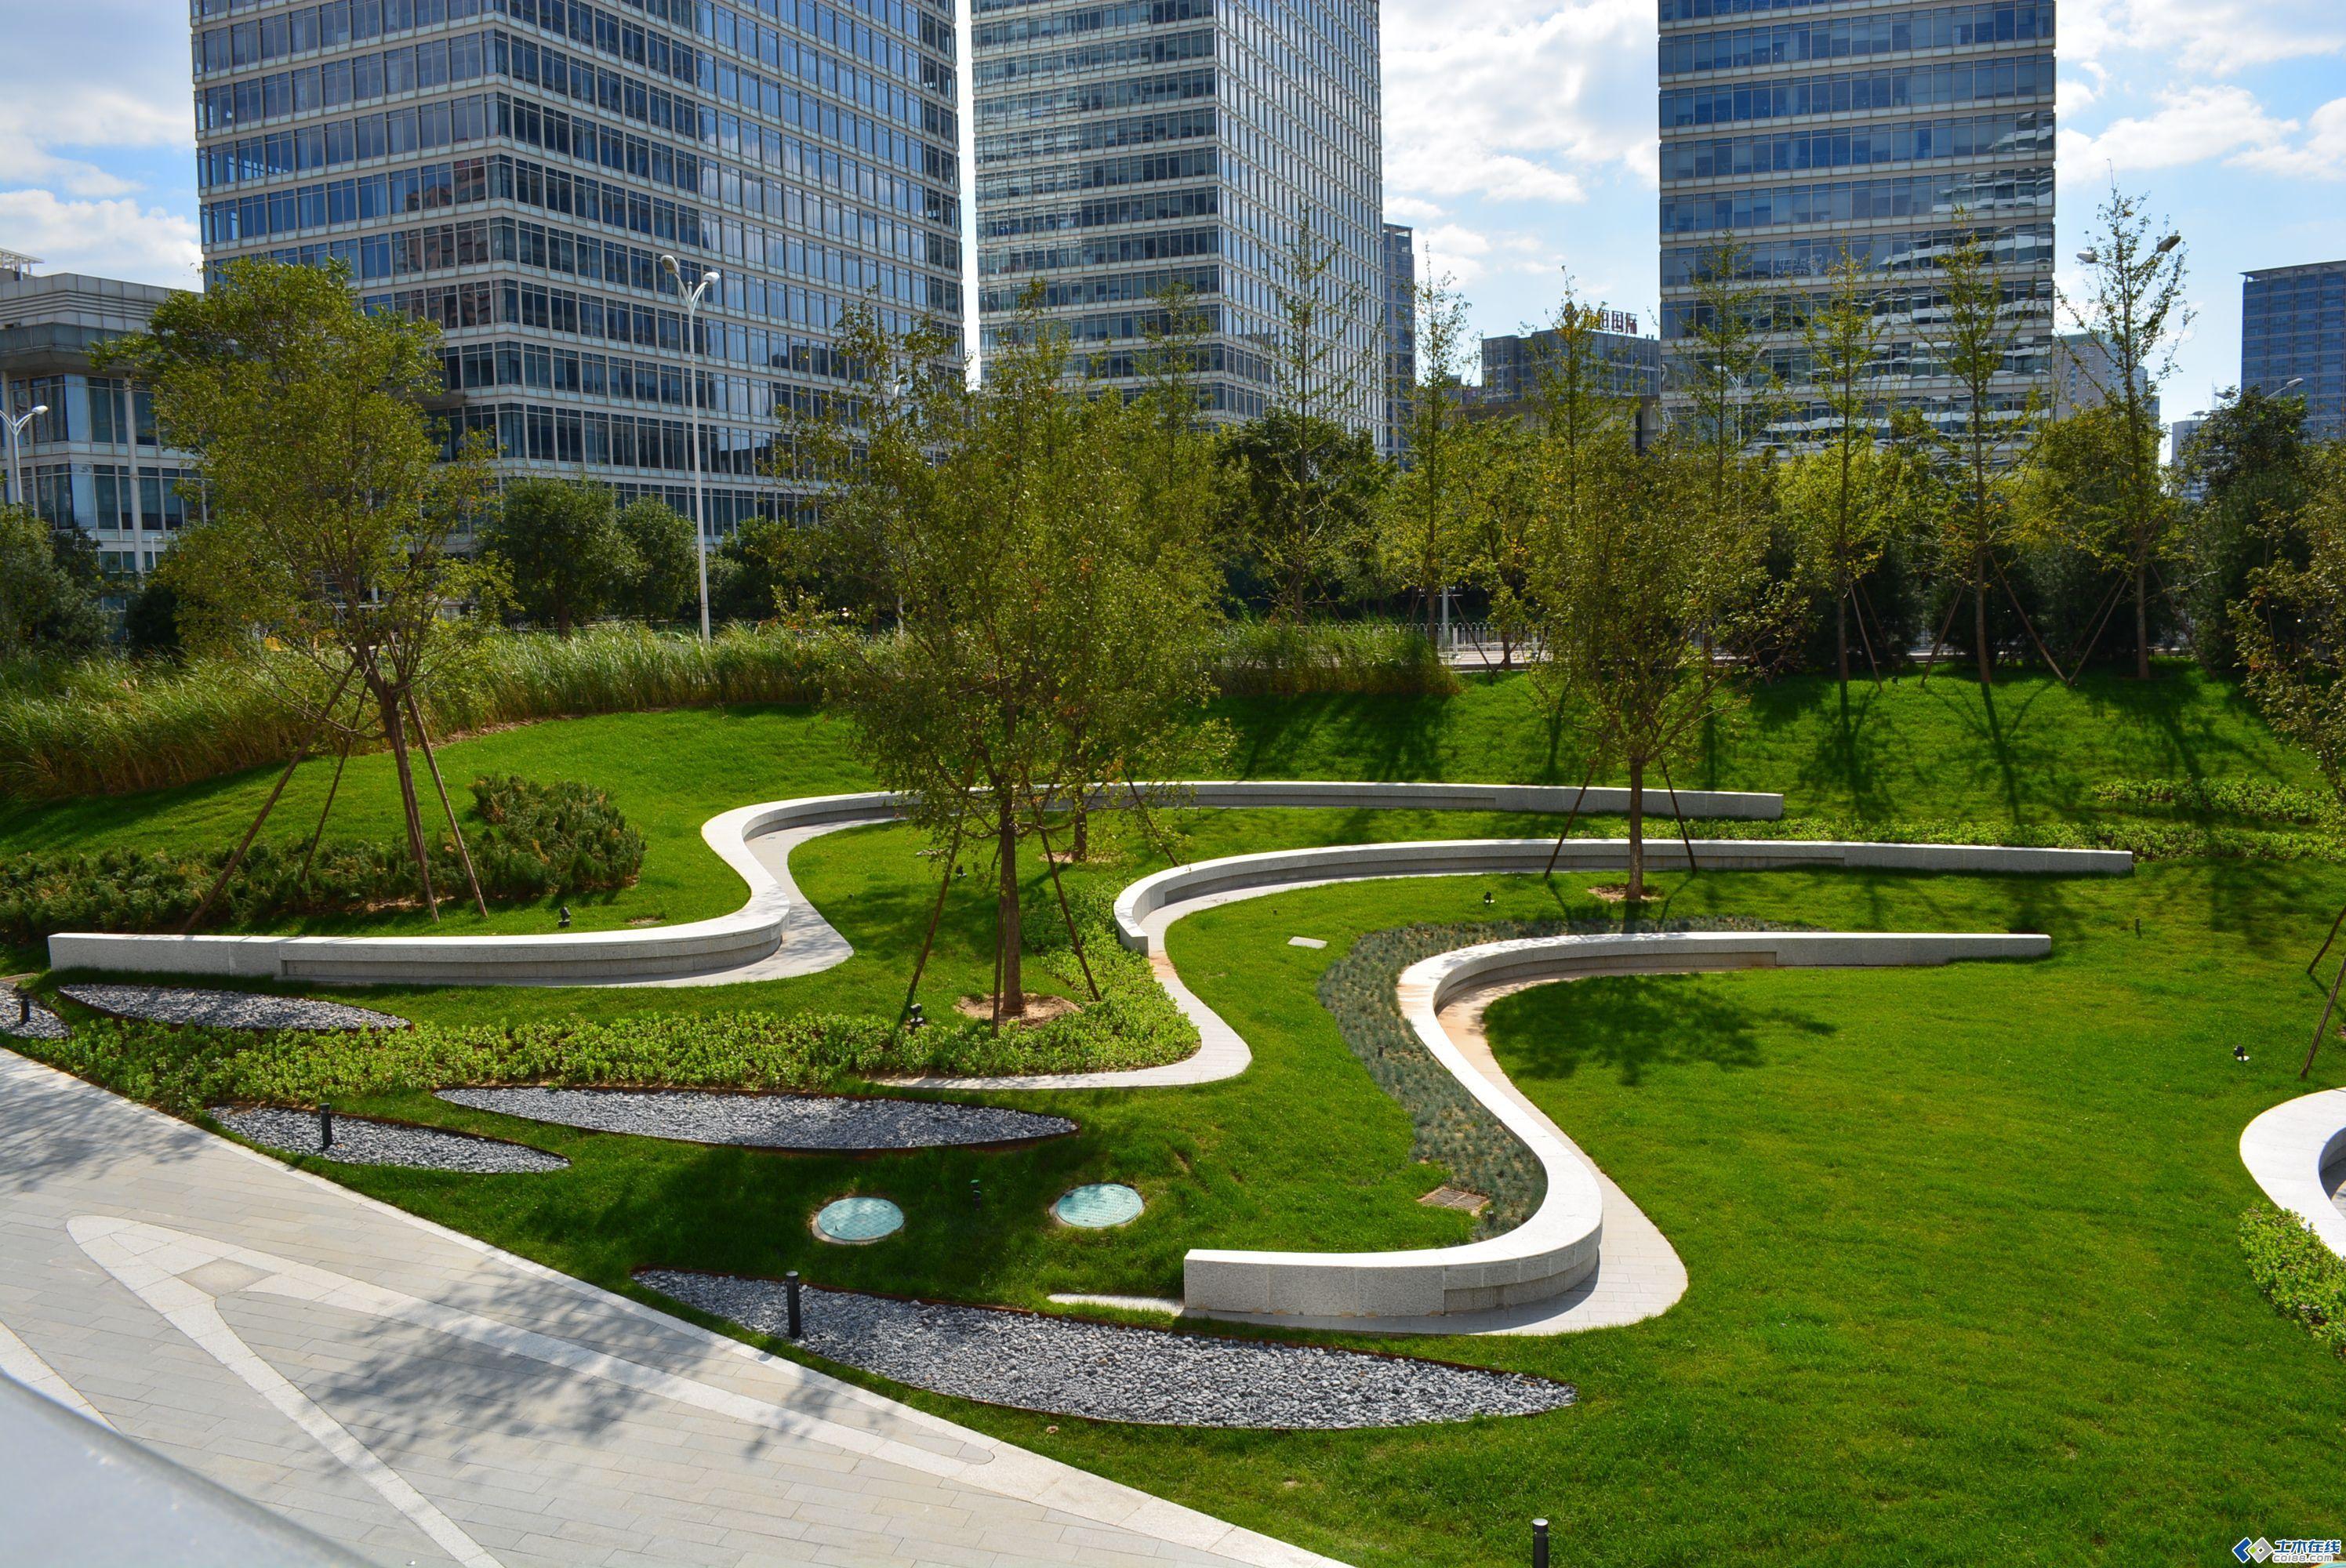 Dsc 0111 Jpg Landscapepark Landscape Architecture Design Public Park Design Landscape Design